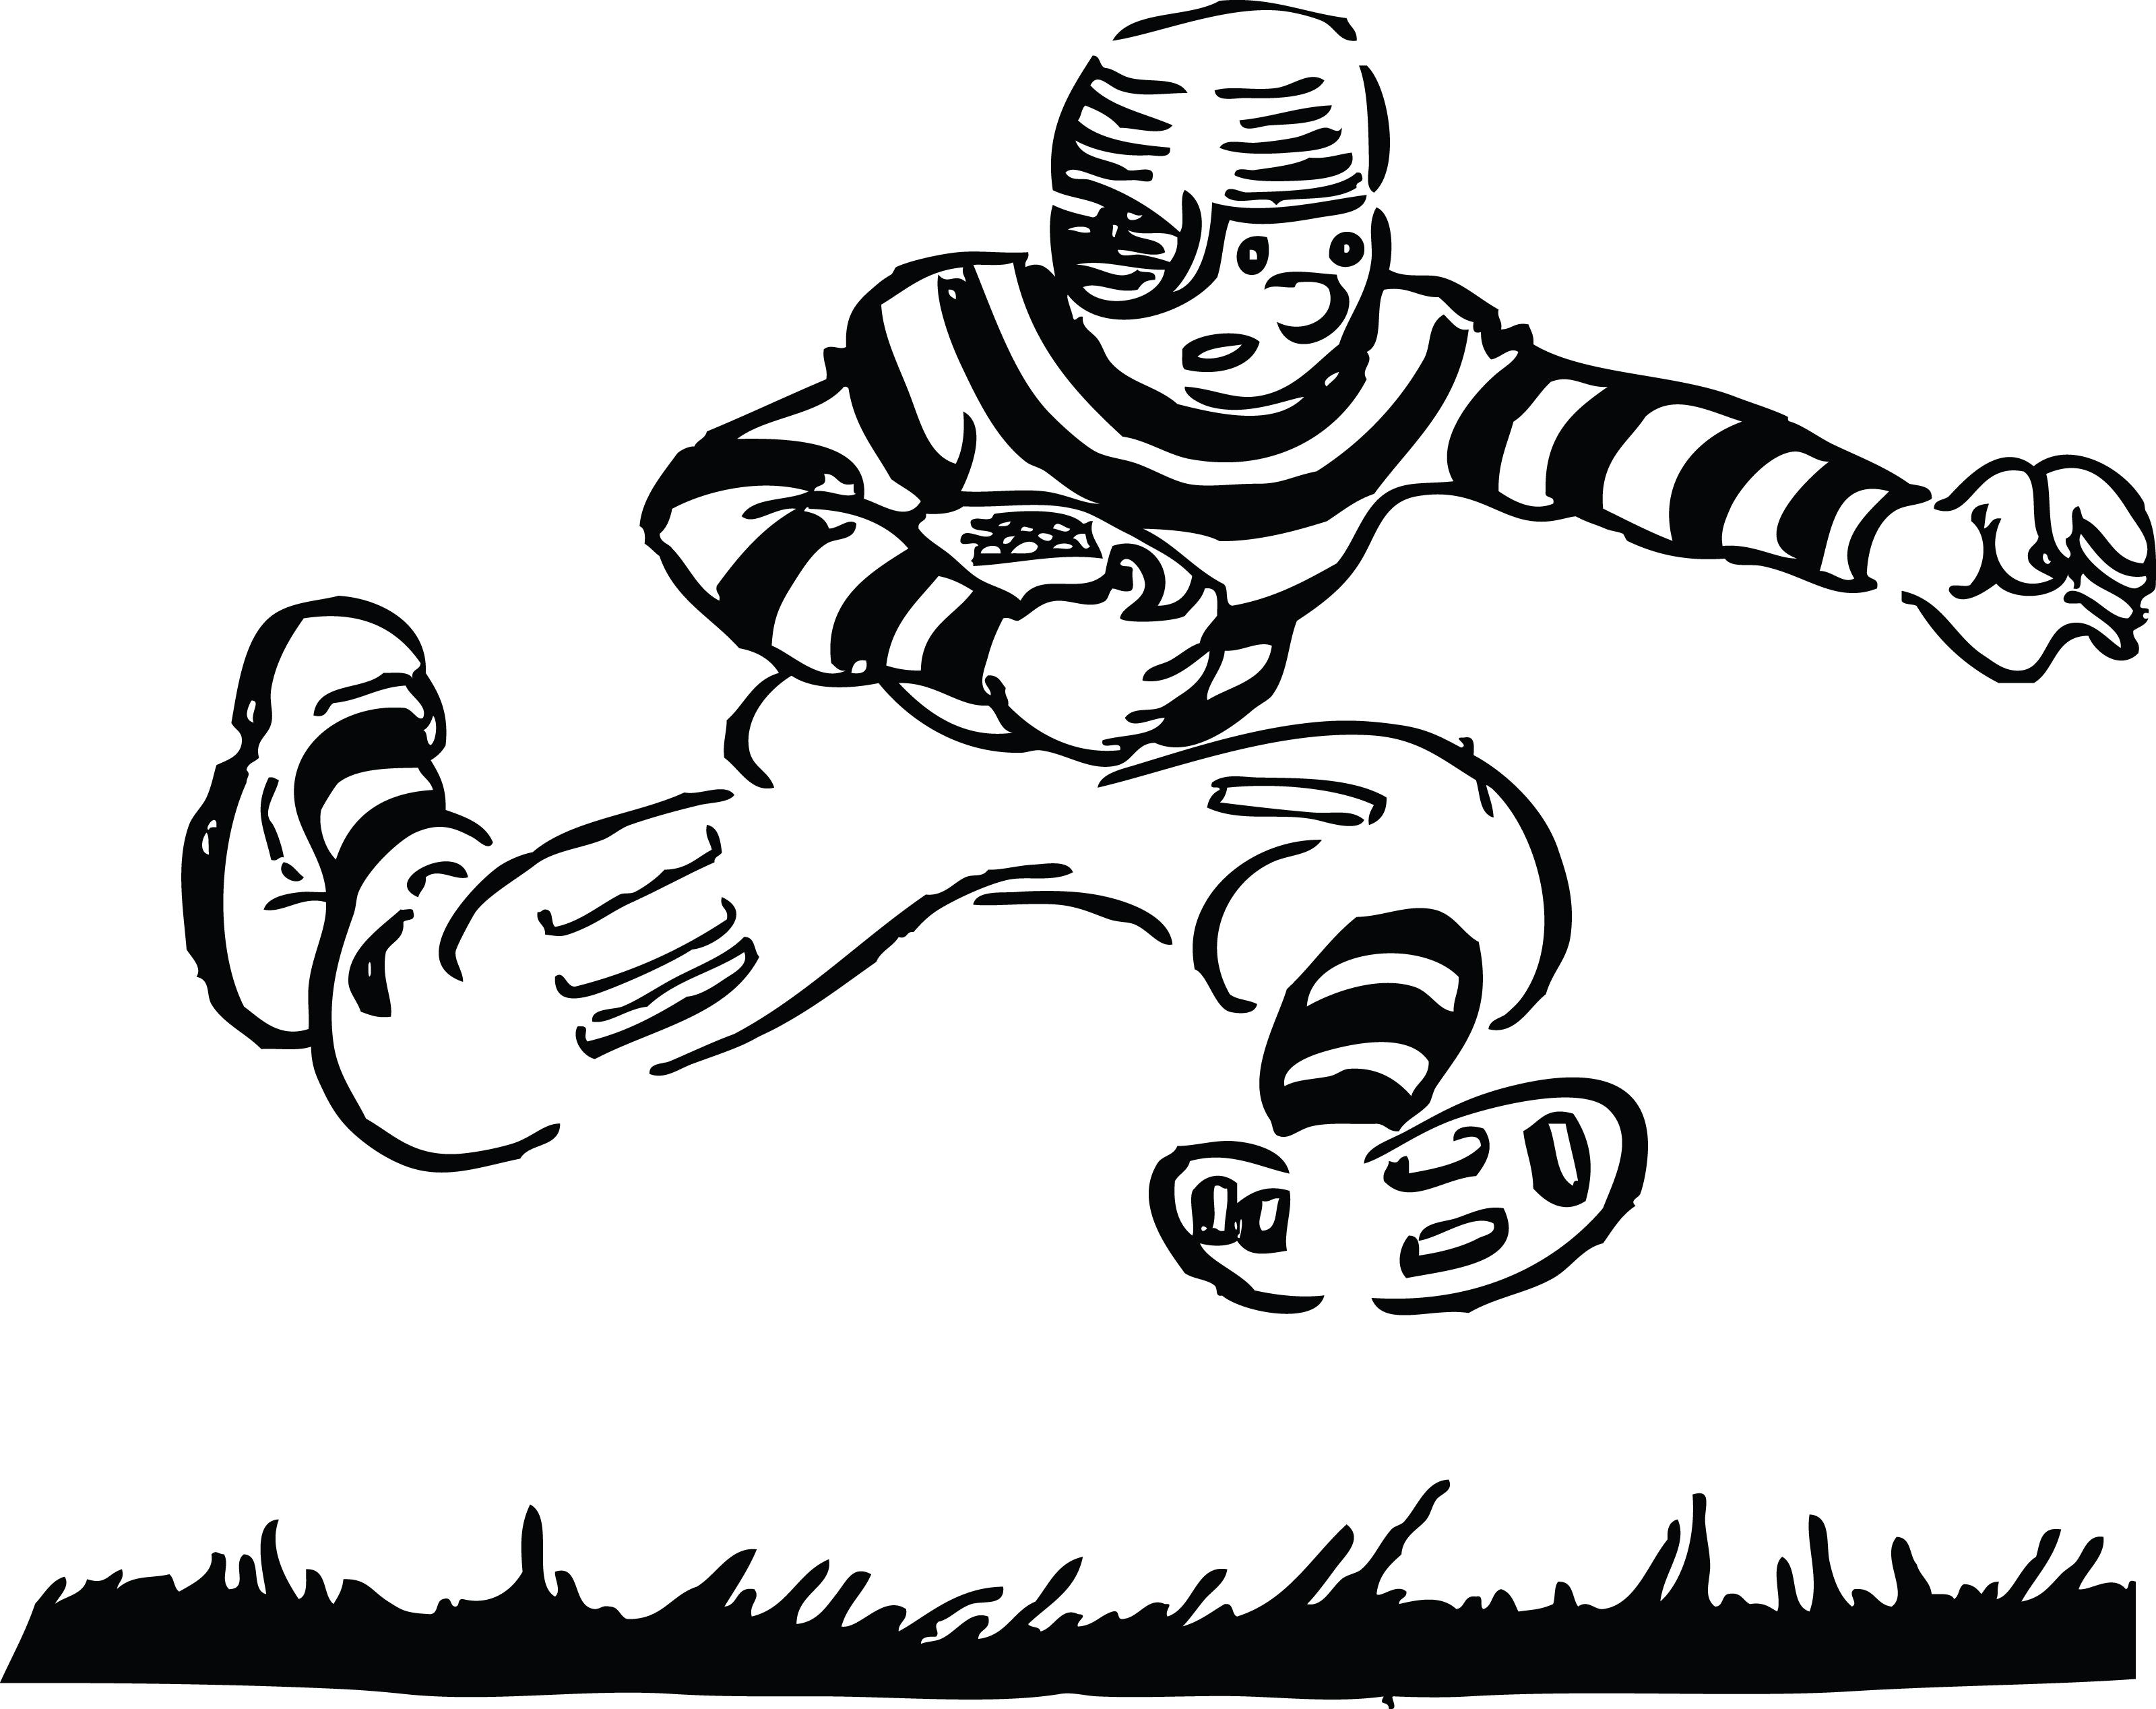 Nfl Football Players Wallpapers Clipart Panda Free Clipart: Nfl Team Logos Clip Art